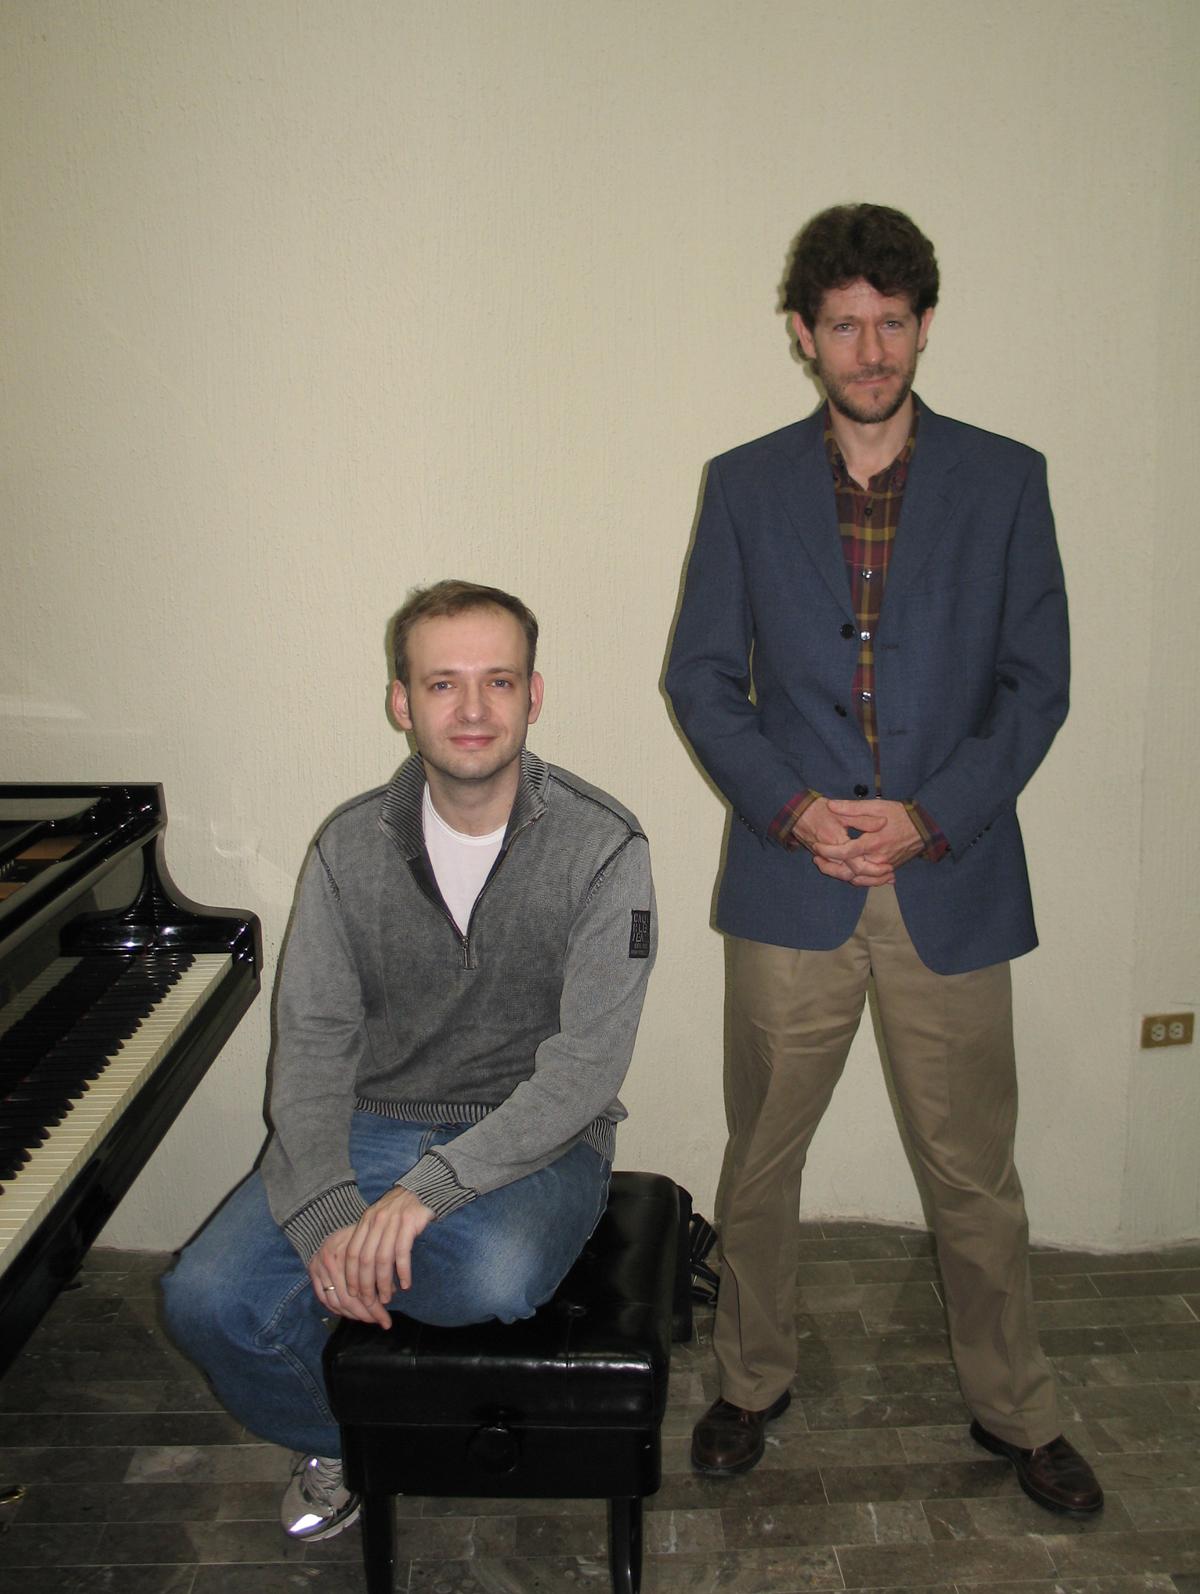 Martin Kasik, pianista invitado